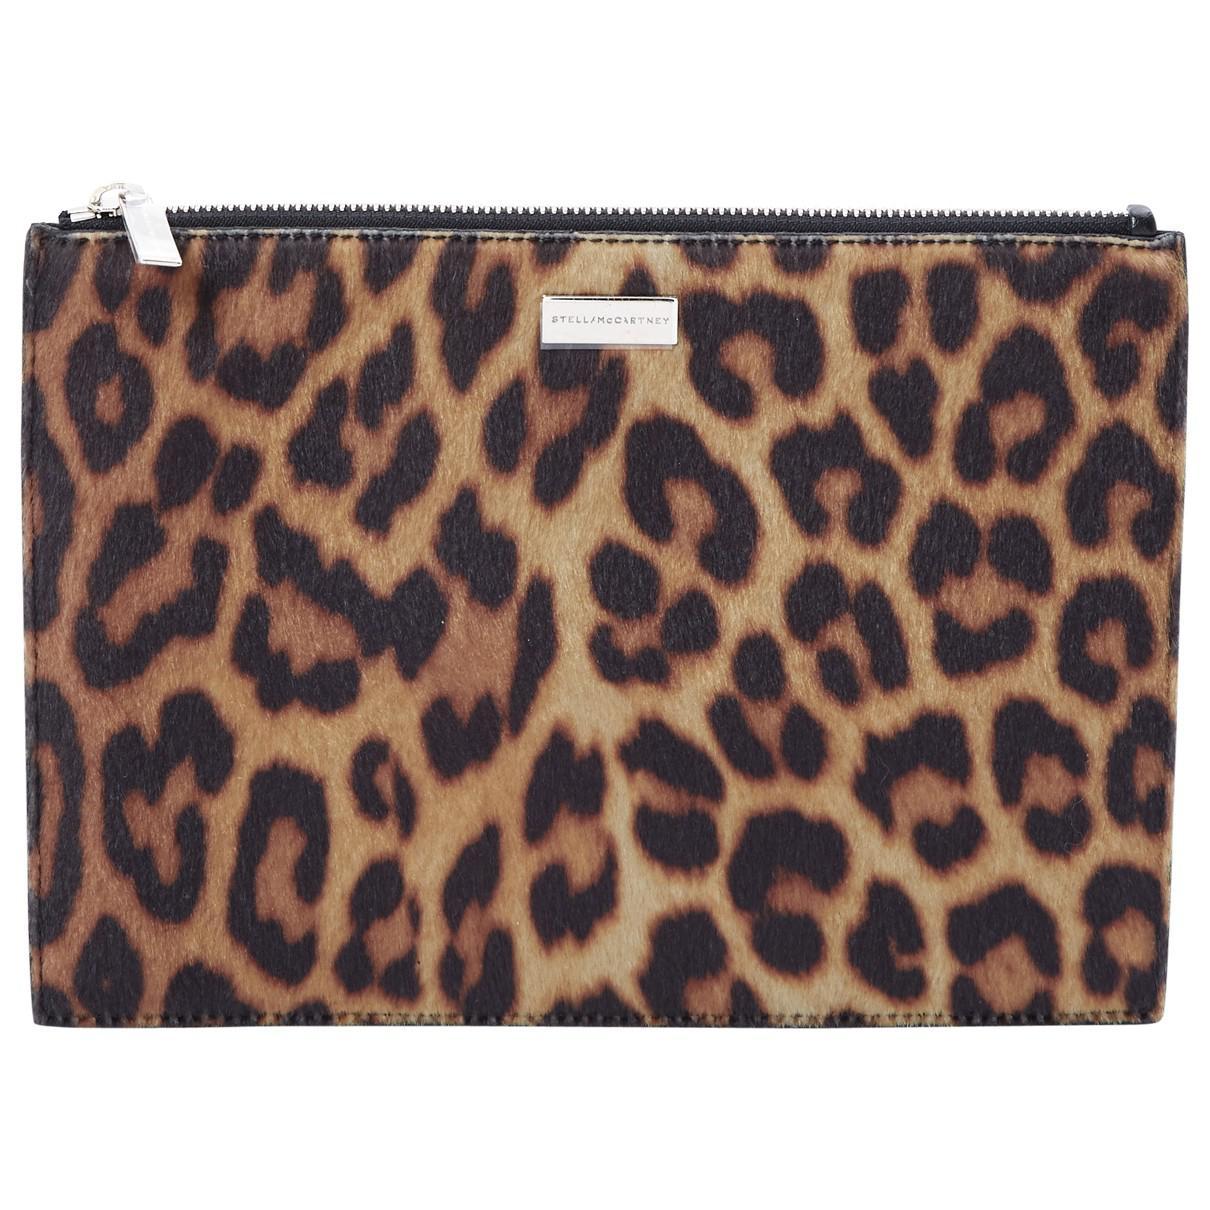 Stella McCartney Pre-owned - Clutch bag J1Gmg7g